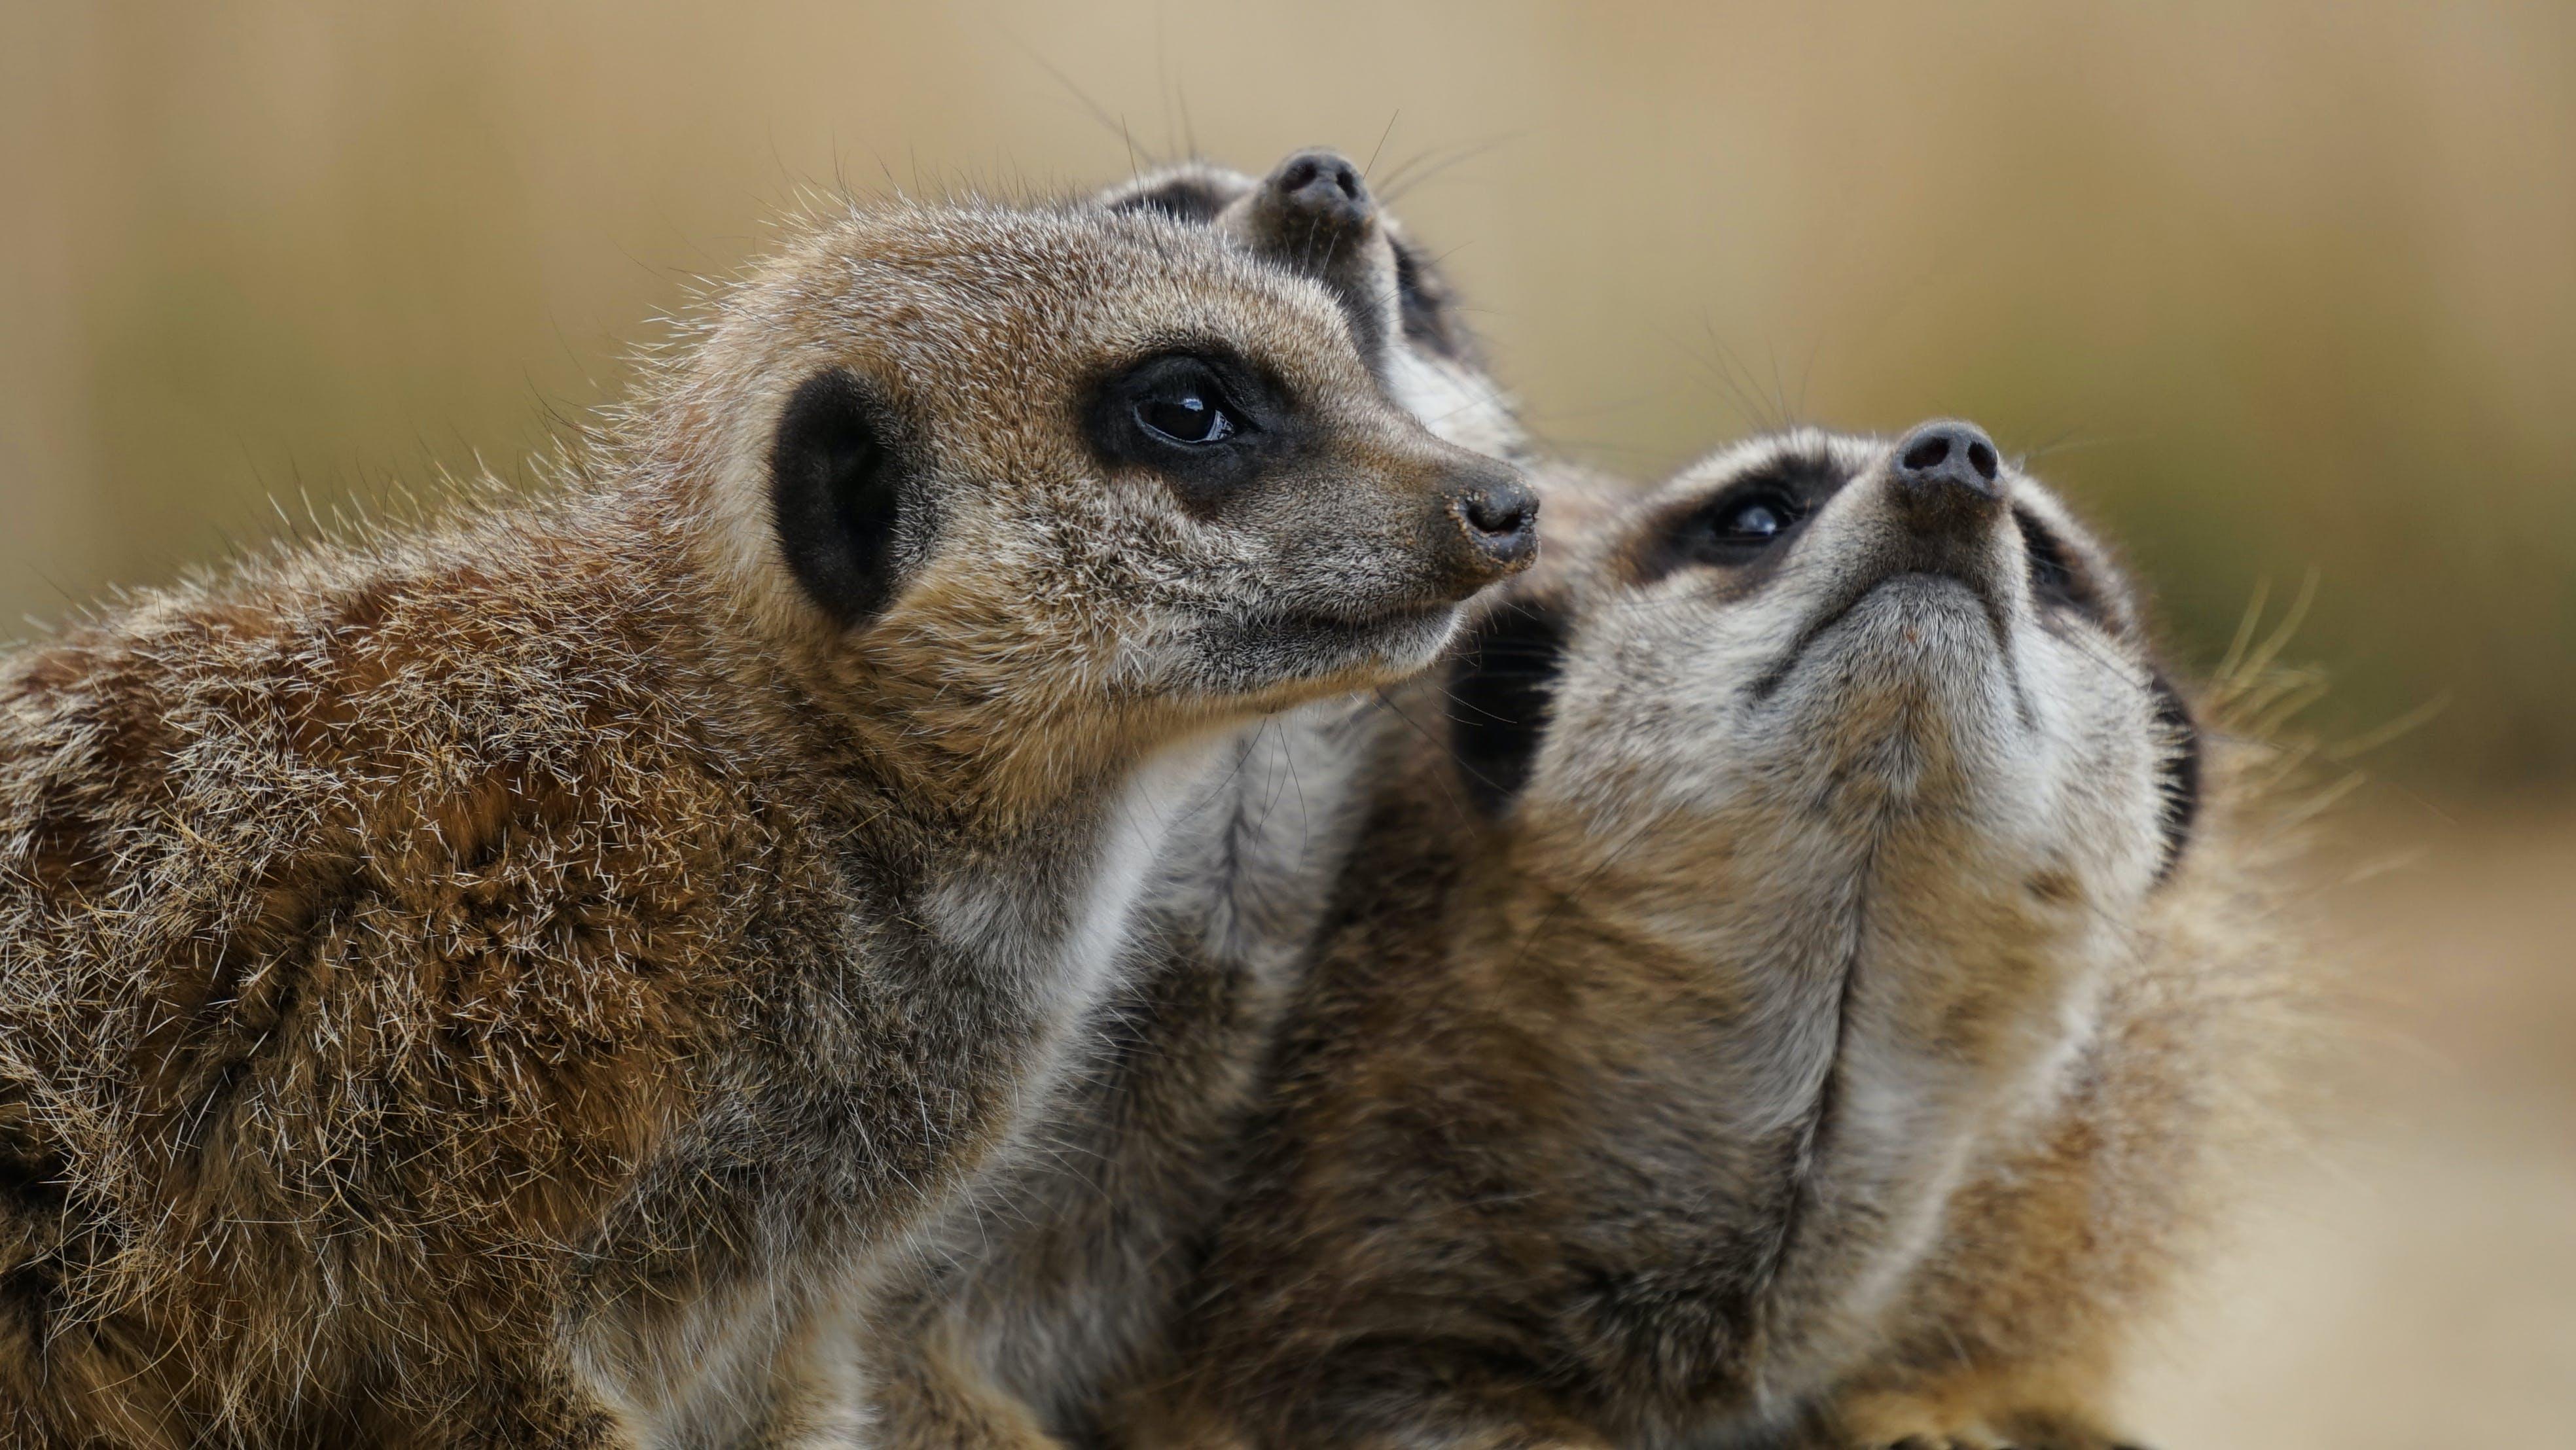 Free stock photo of animals, wild animals, mammals, meerkats